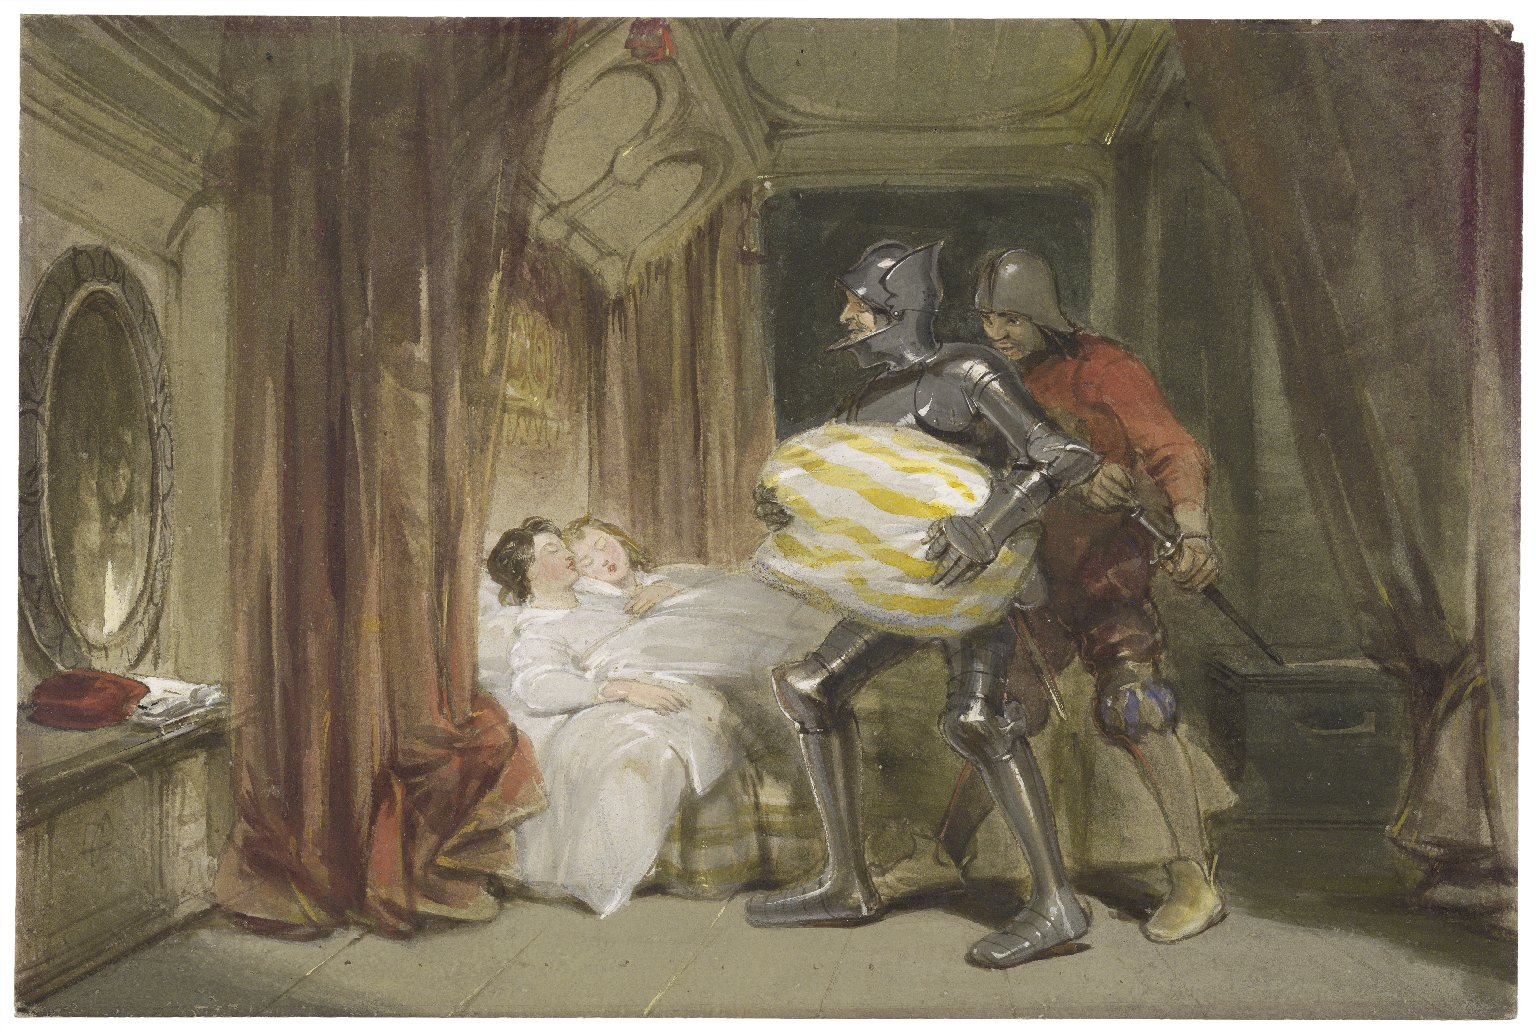 [King Richard III, V, 3] [graphic] / [George Cattermole].